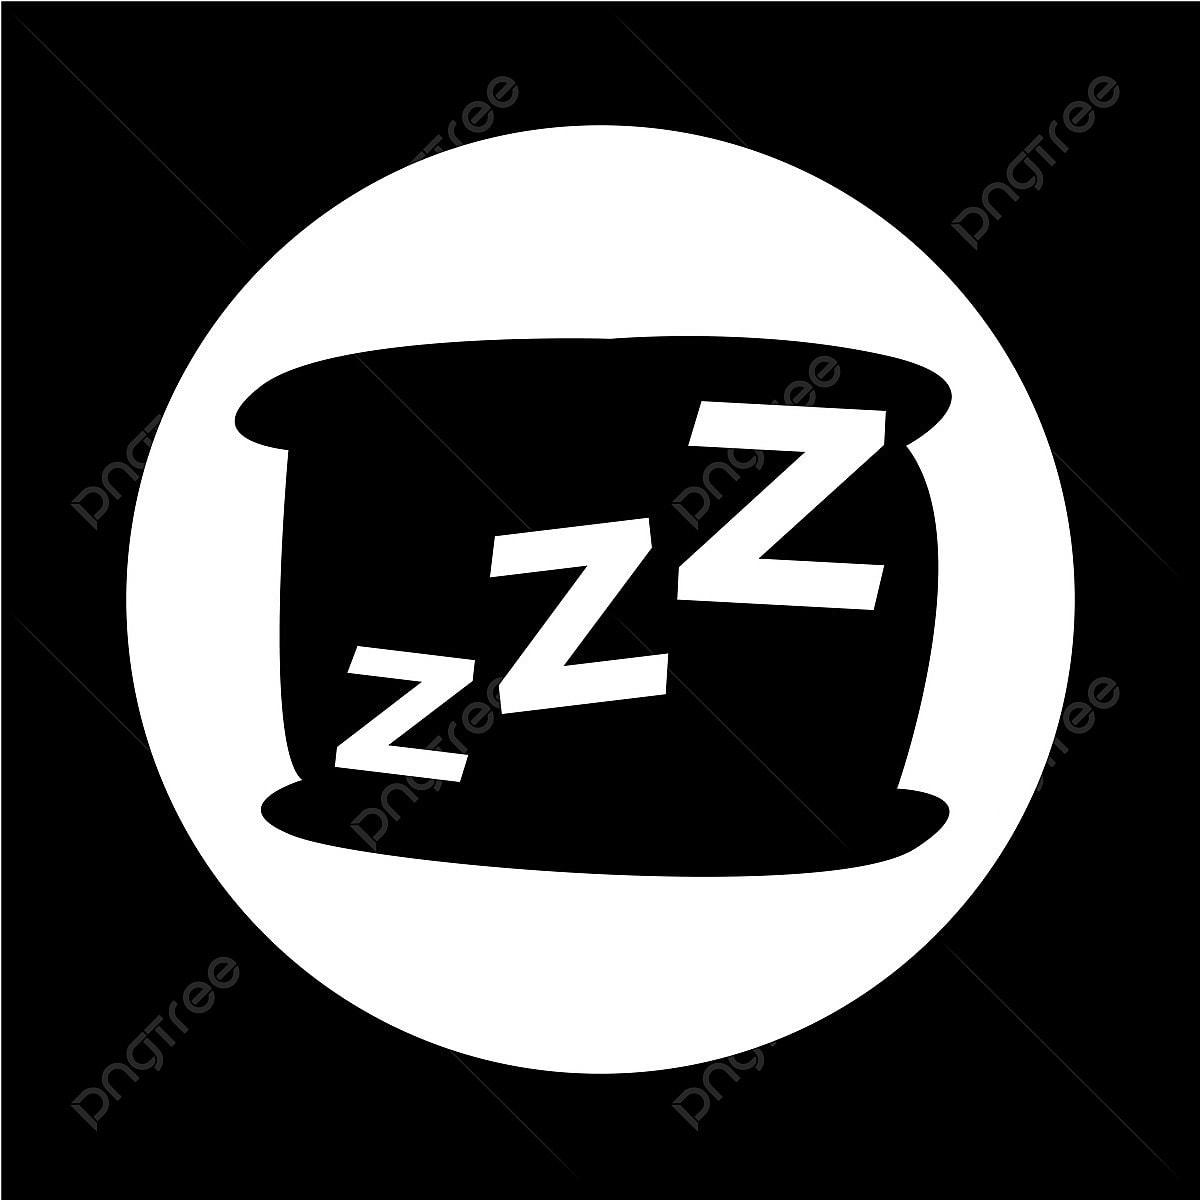 une ic u00f4ne avec un oreiller de couchage dormir ic u00f4ne vector